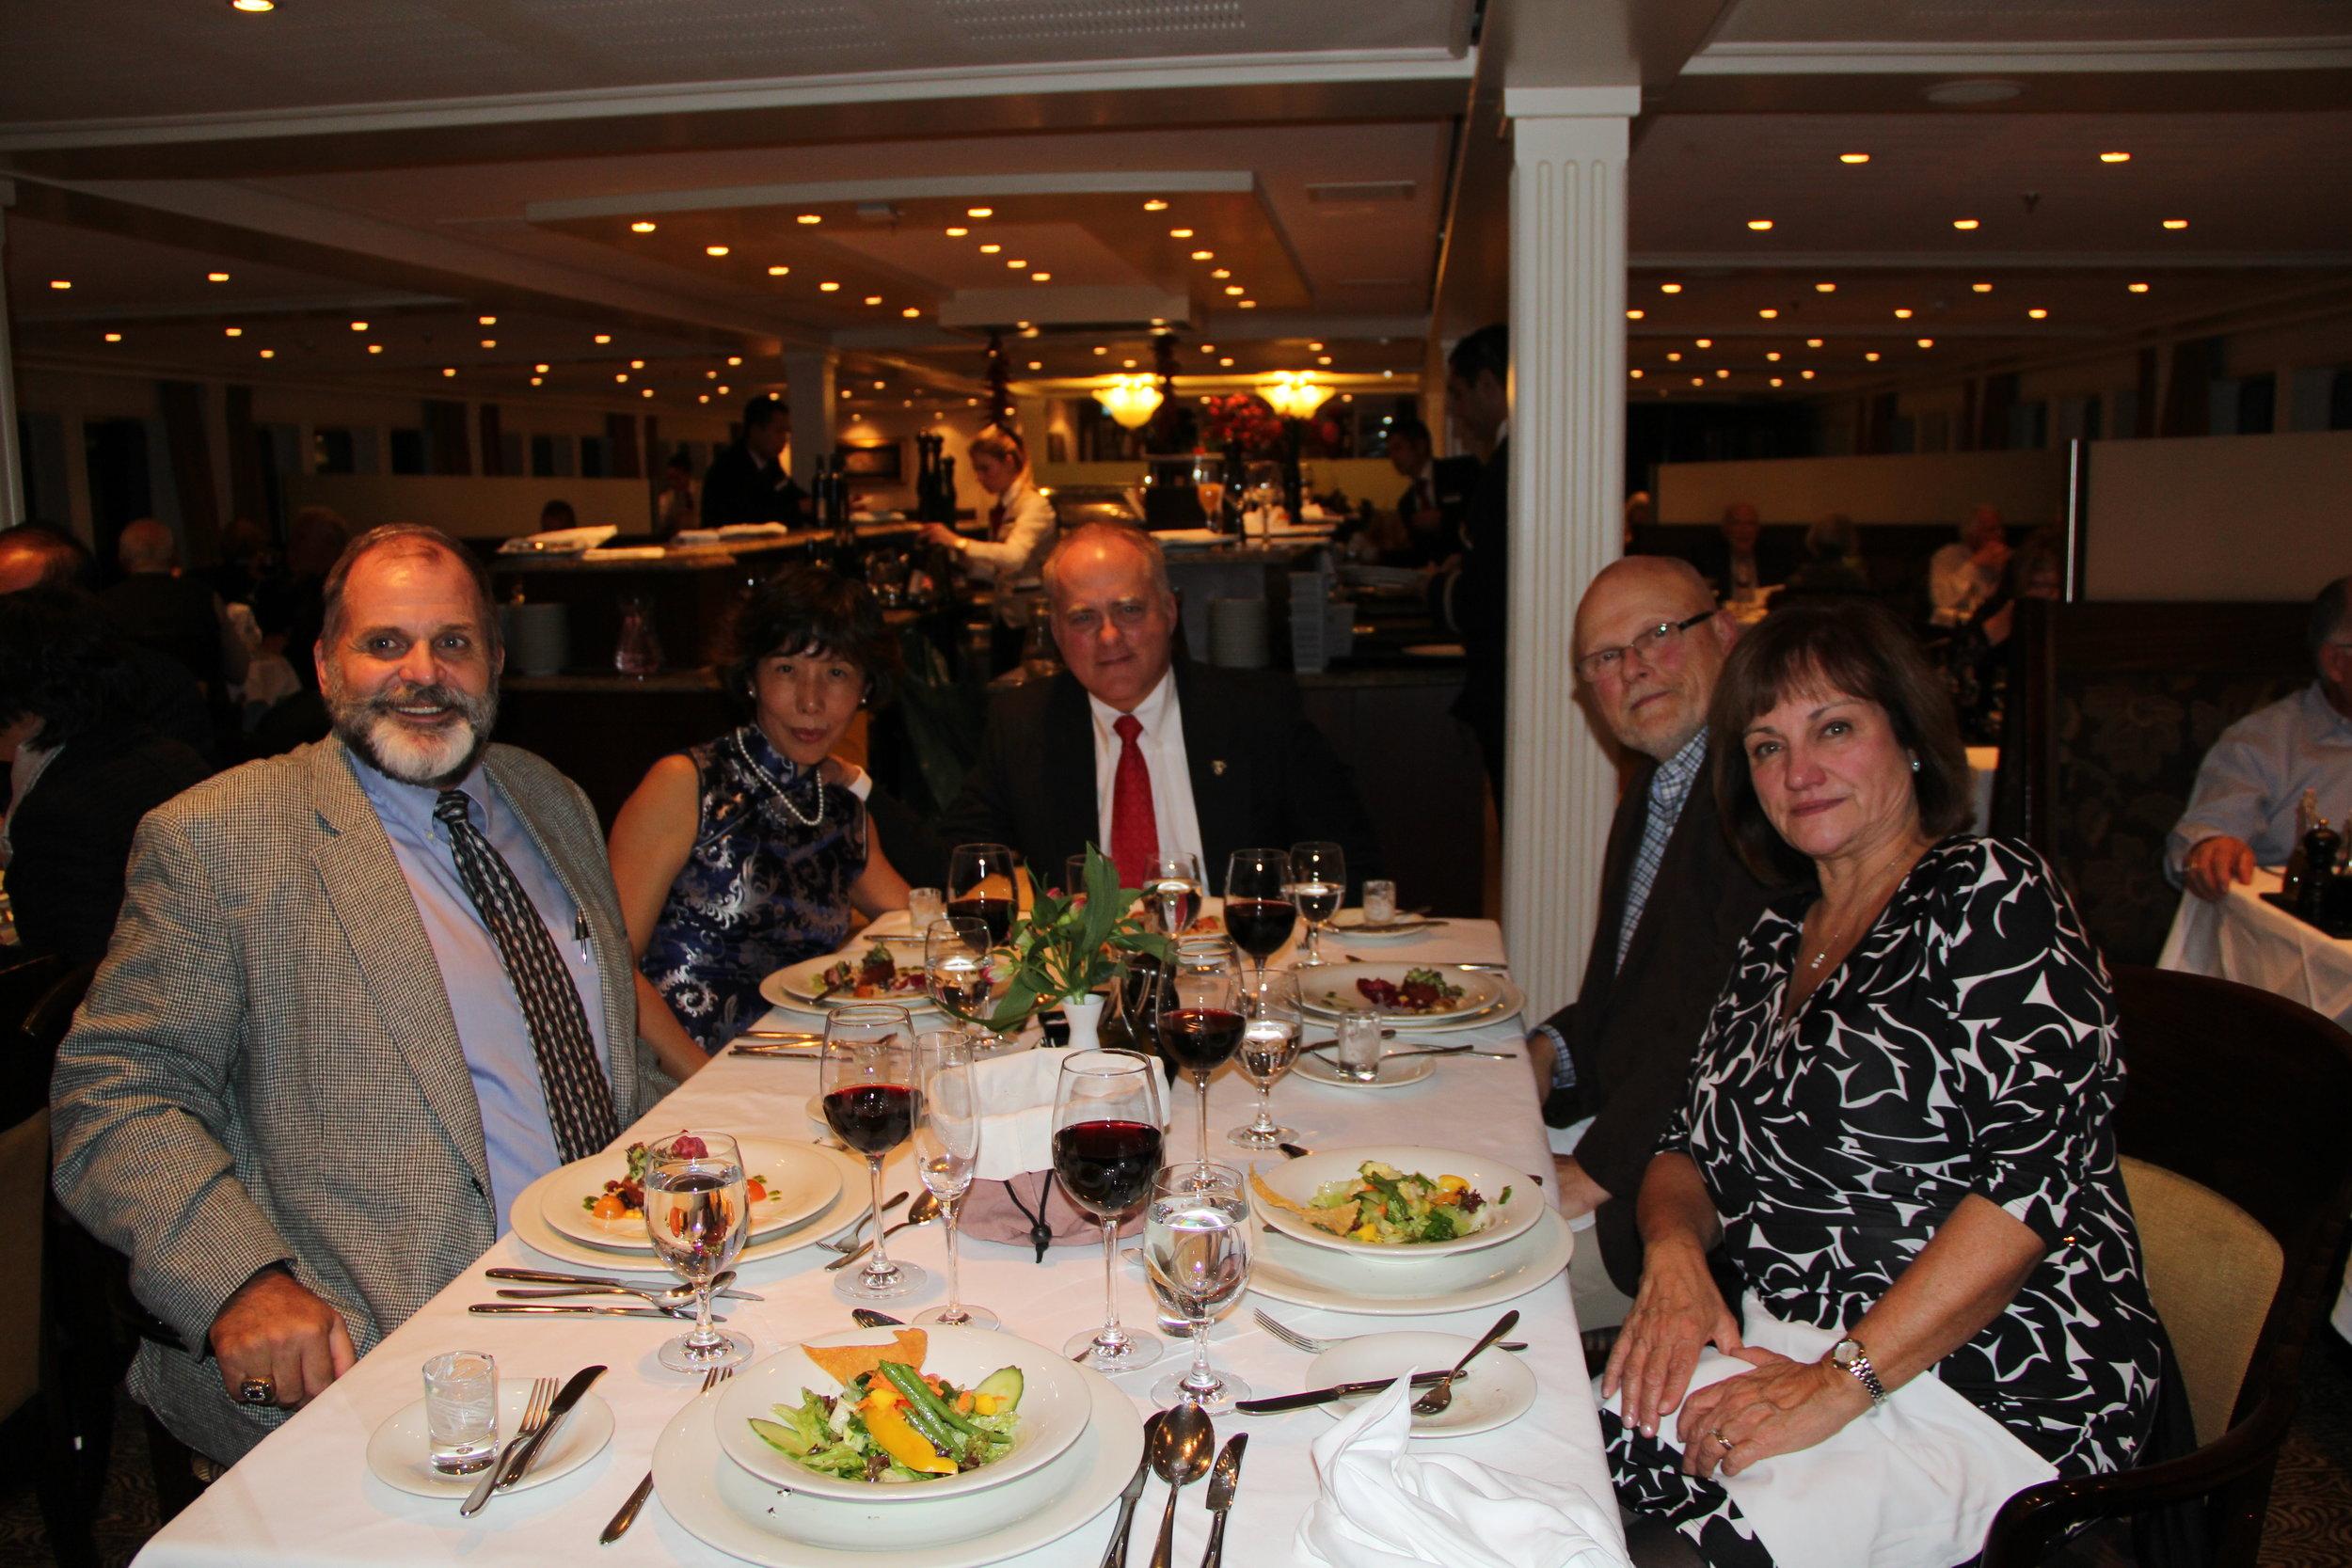 Hank (USMA '71), Jane, Len (USMA '74), Jim (USMA '71) and Maureen on an AmaWaterways River Cruise